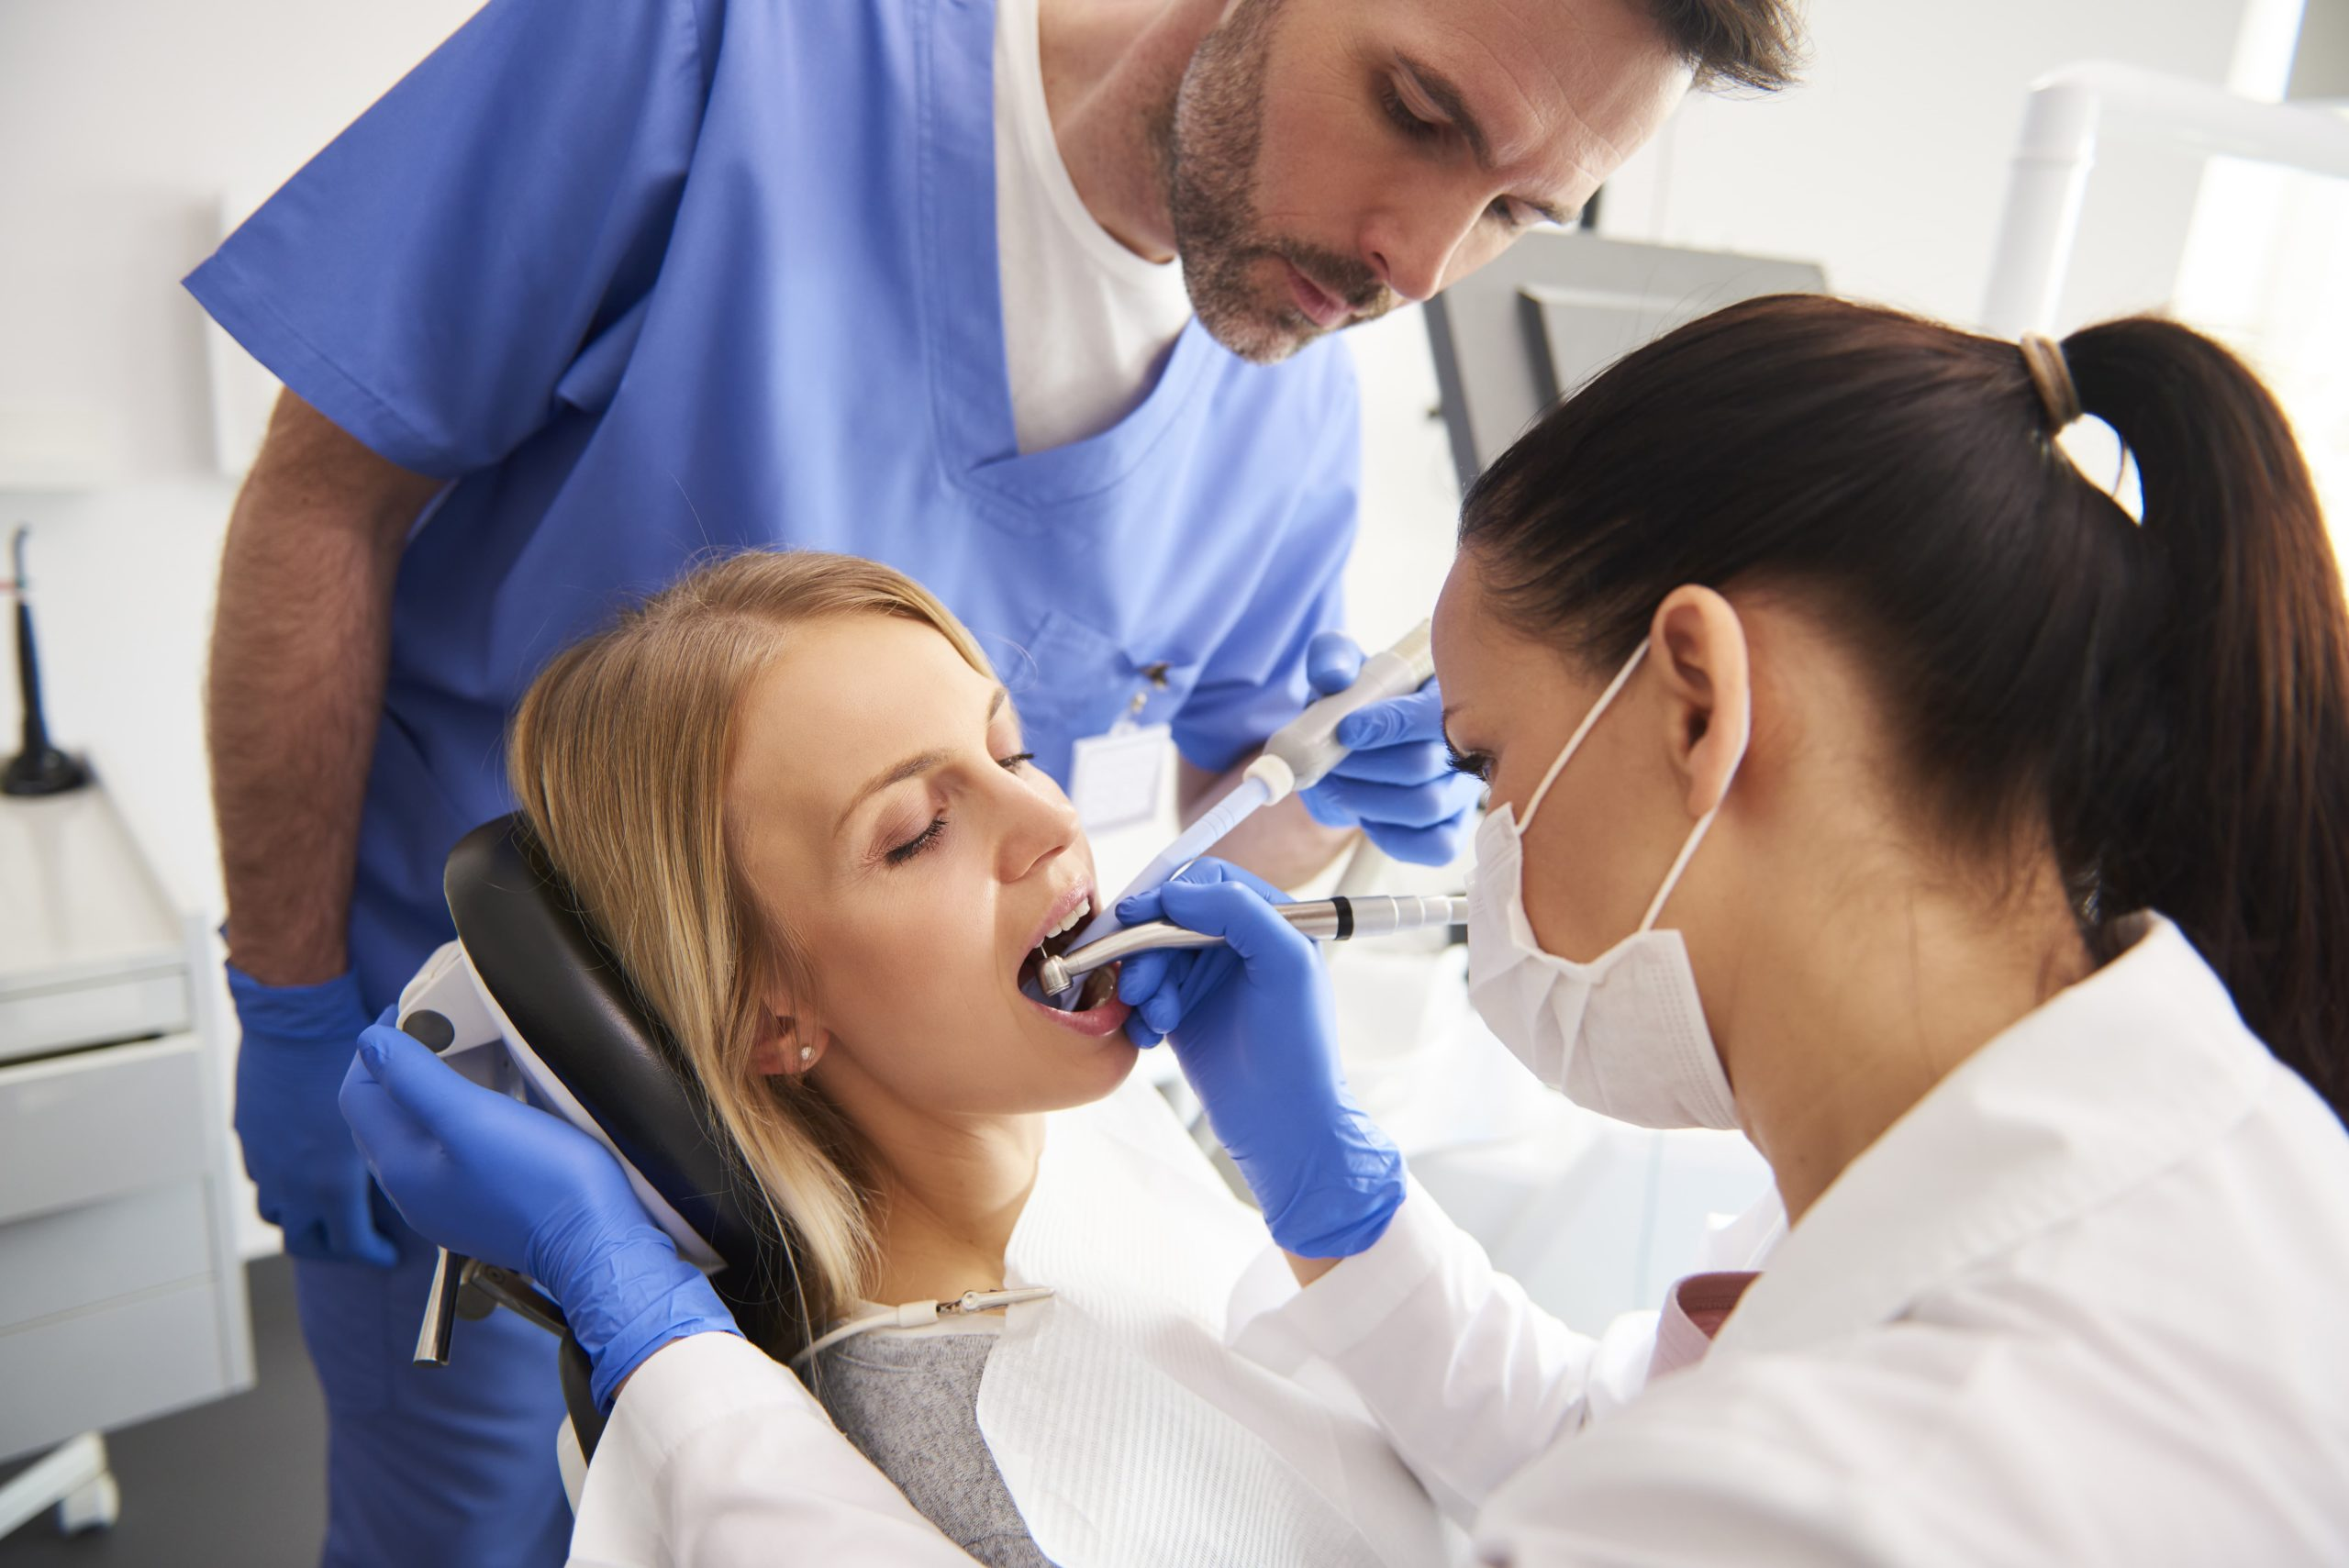 Start your dental assistant certification today | CareerStep